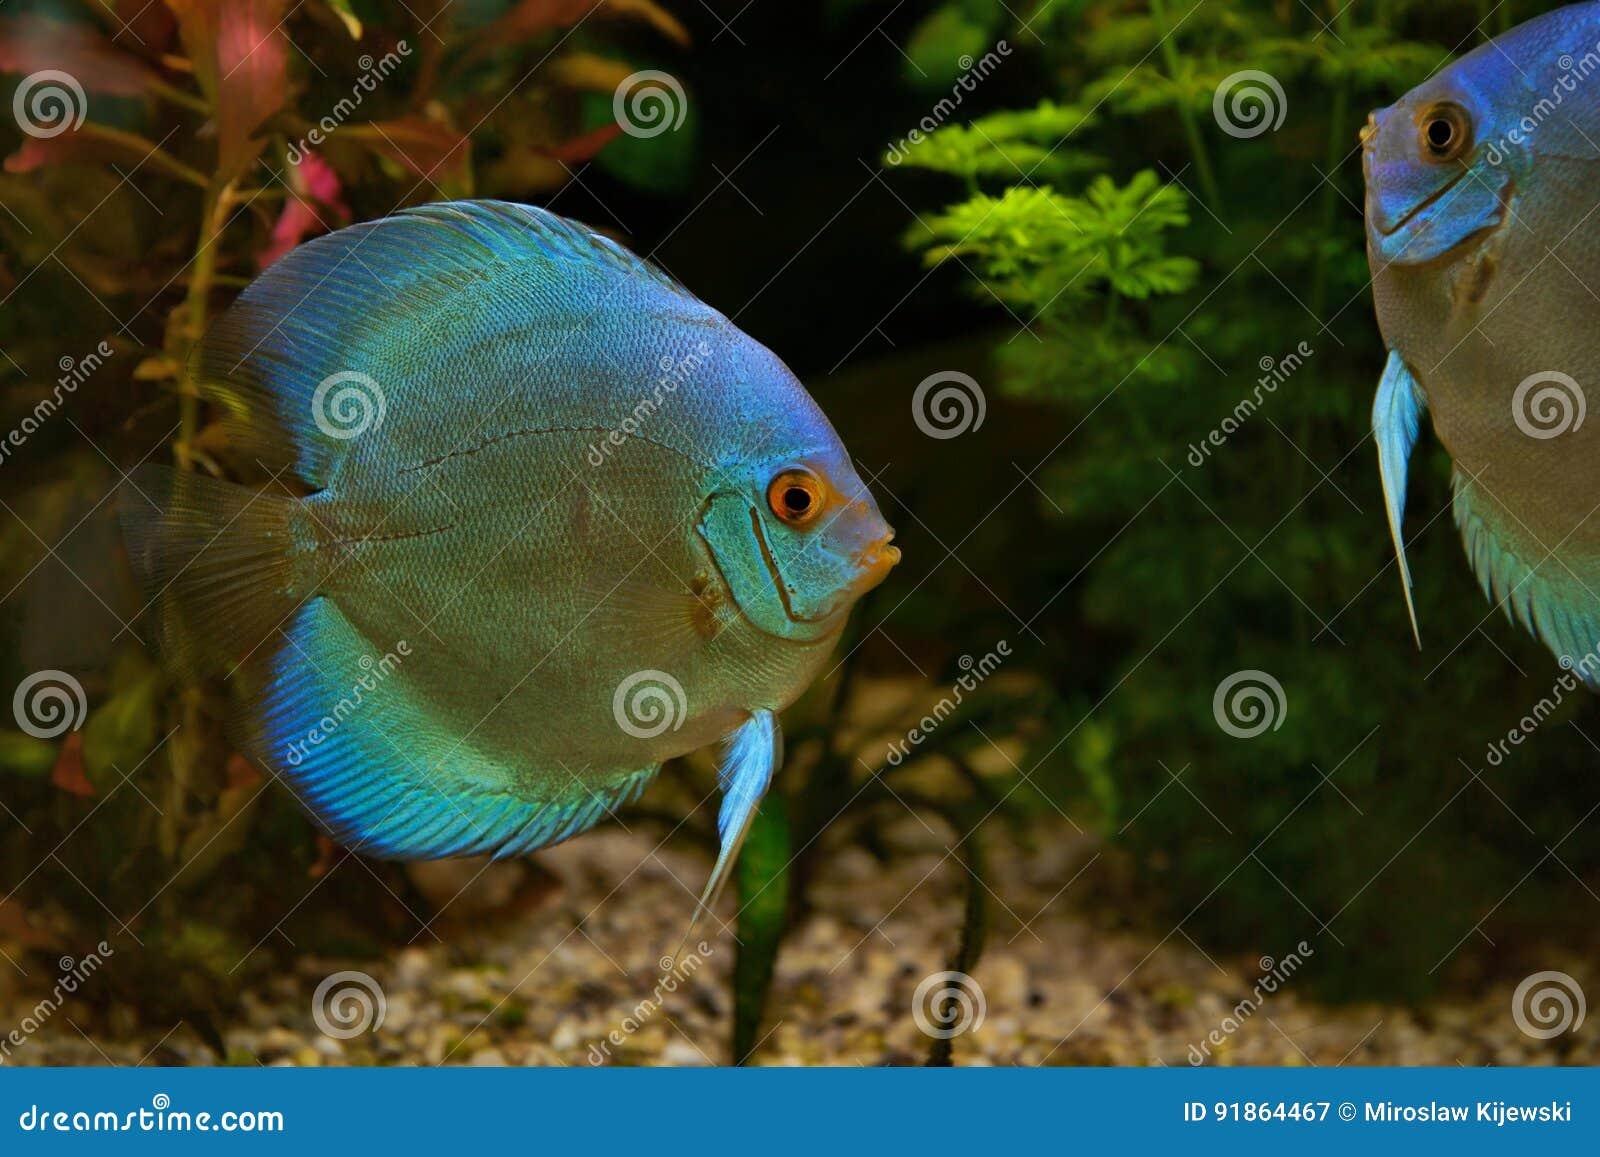 Discus Symphysodon Cichlids In The Aquarium The Freshwater Fish